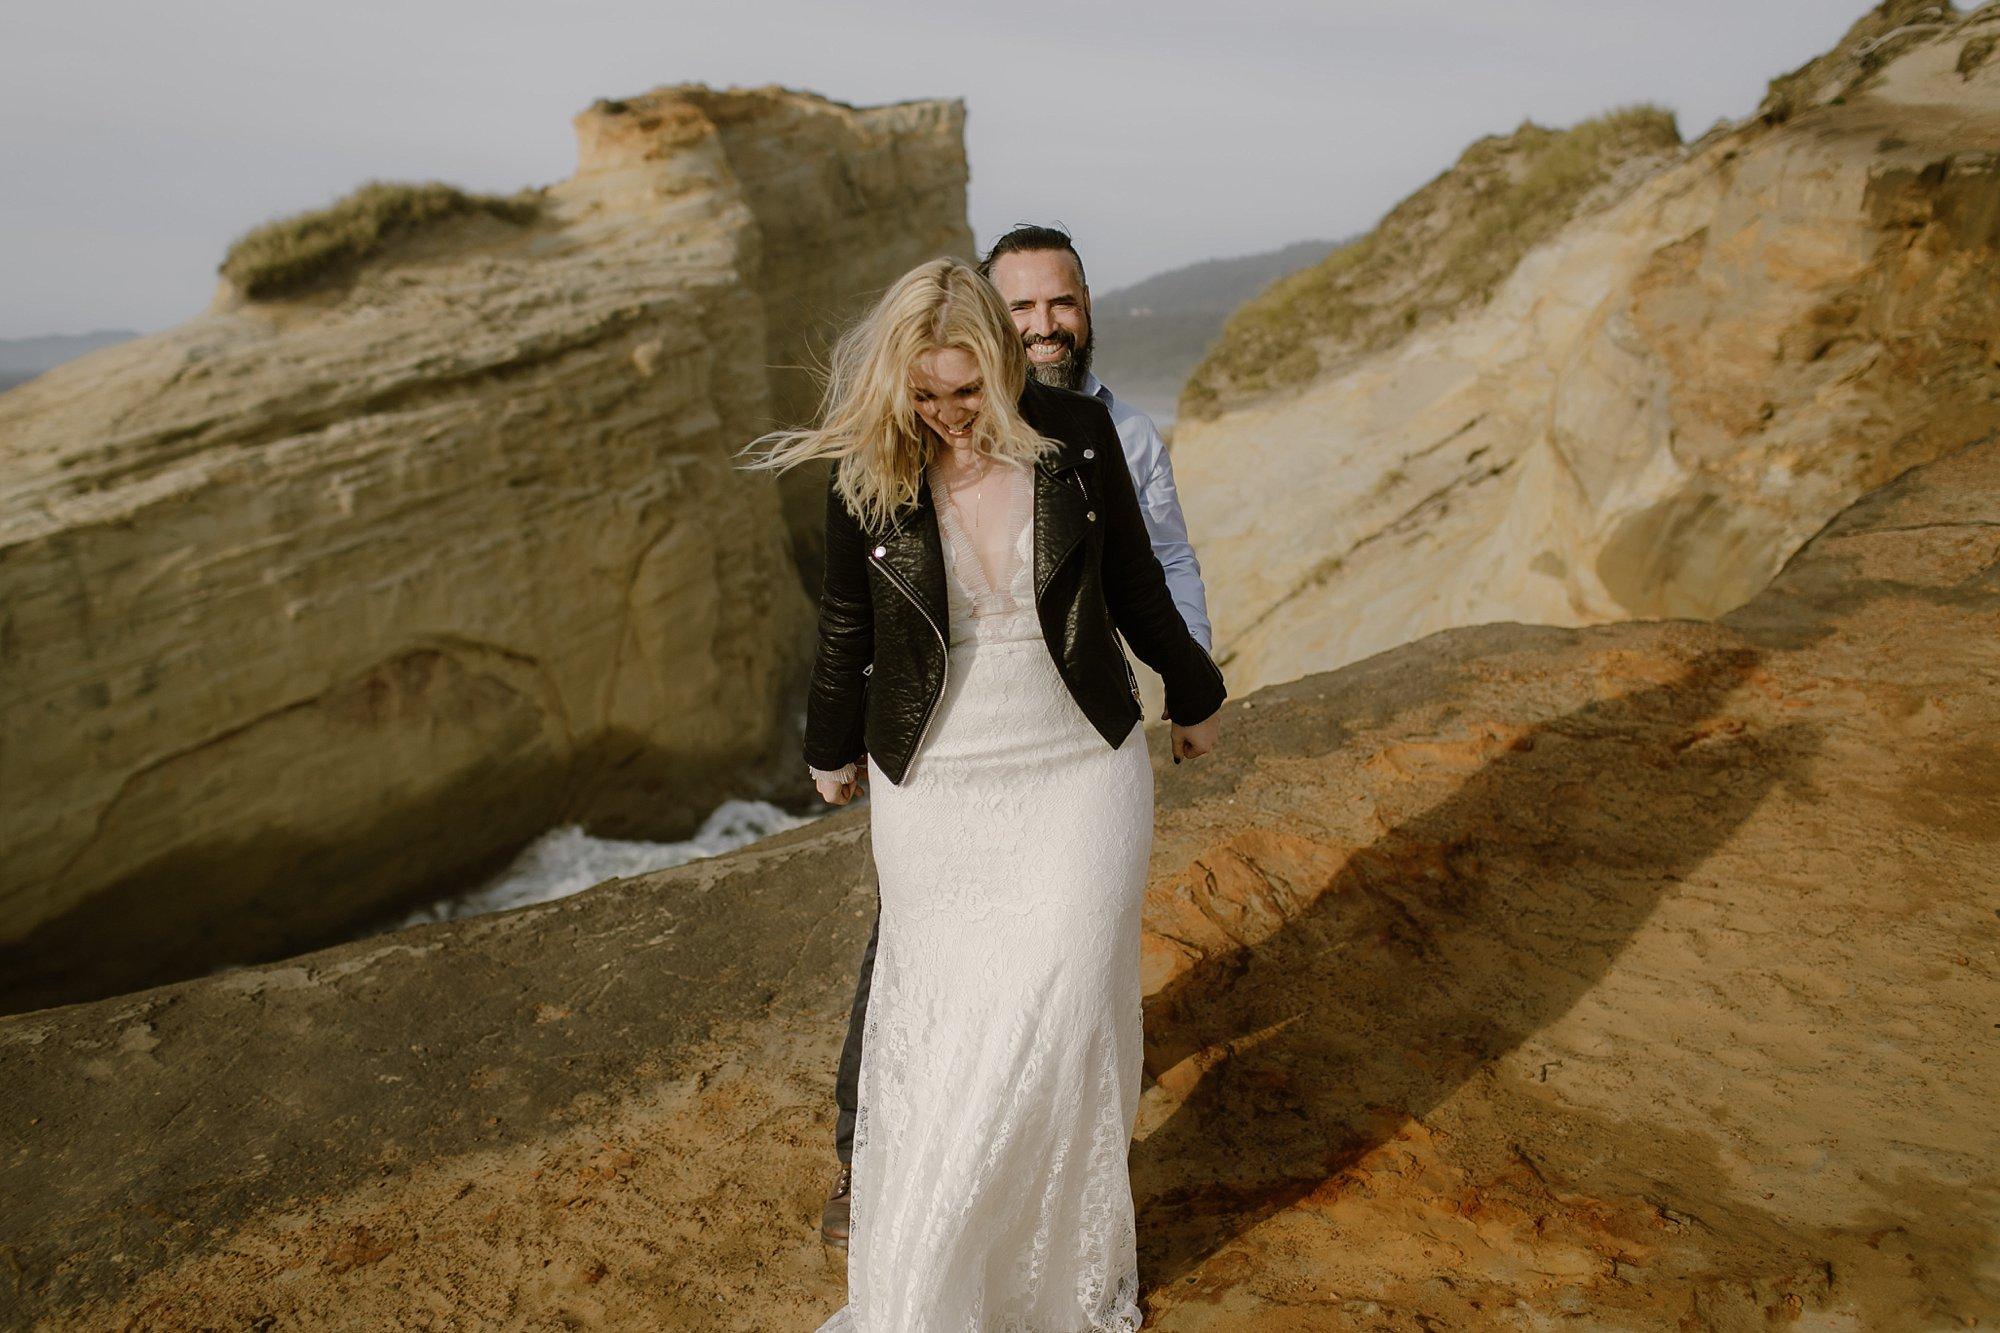 cape-kiwanda-elopement-wedding_0005.jpg